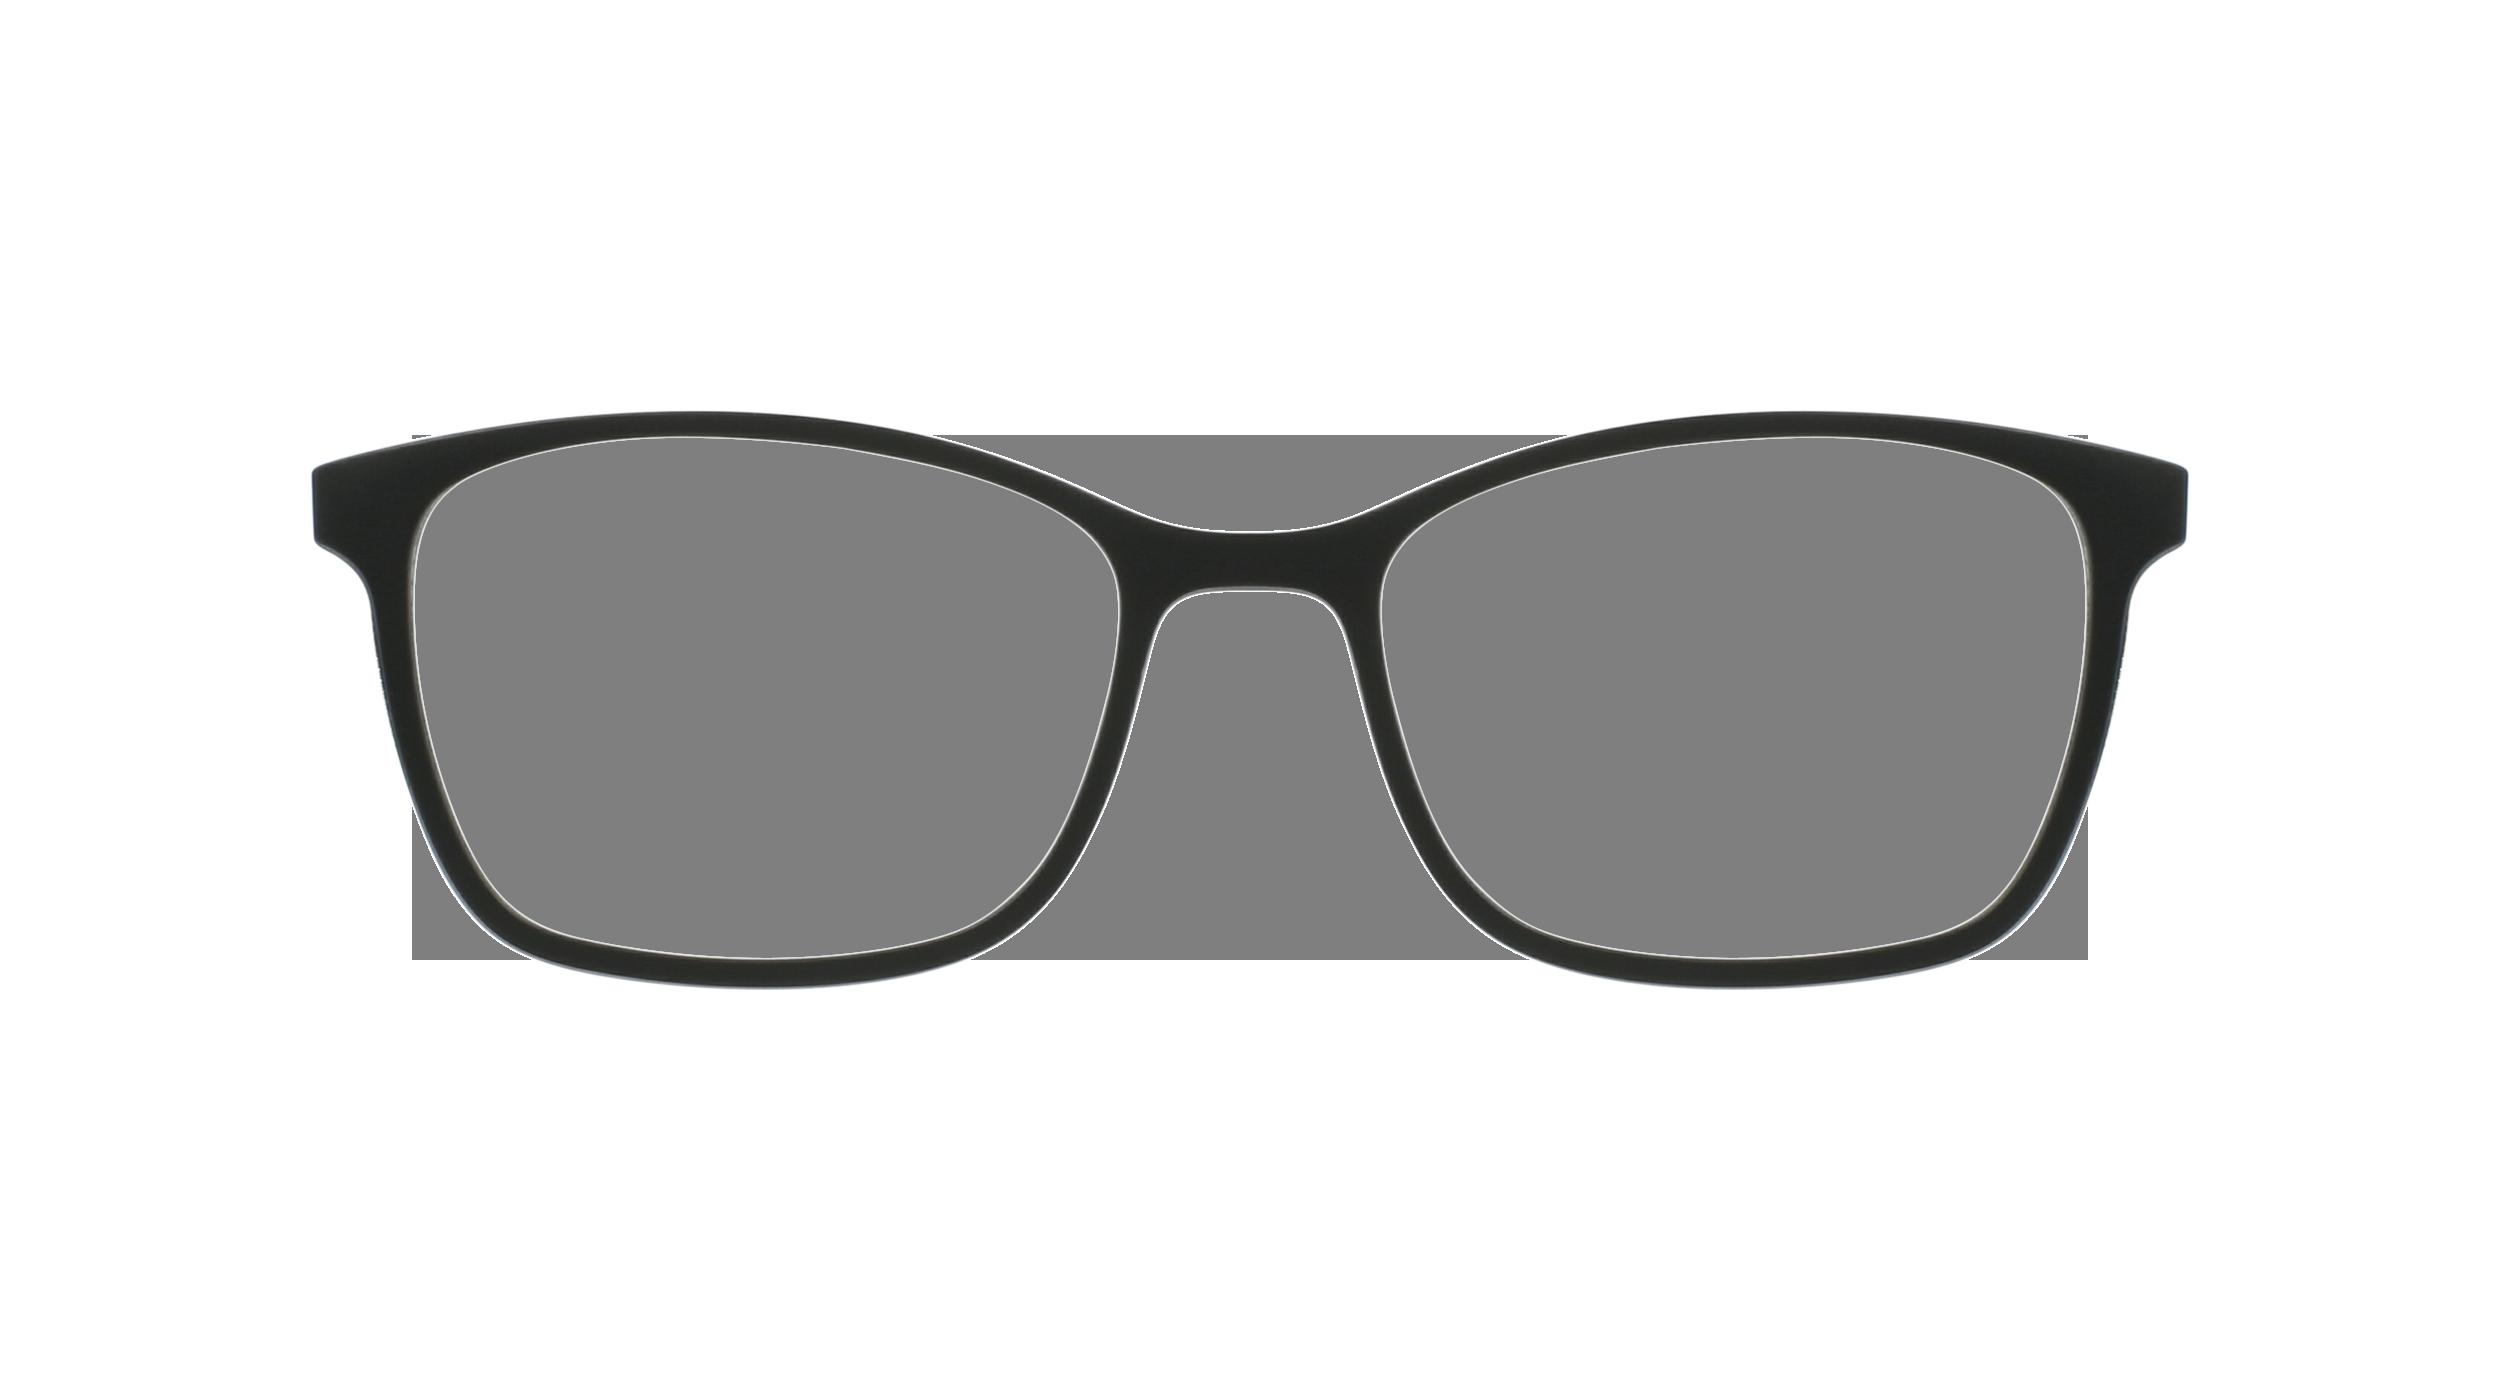 afflelou/france/products/smart_clip/clips_glasses/07630036459096.png